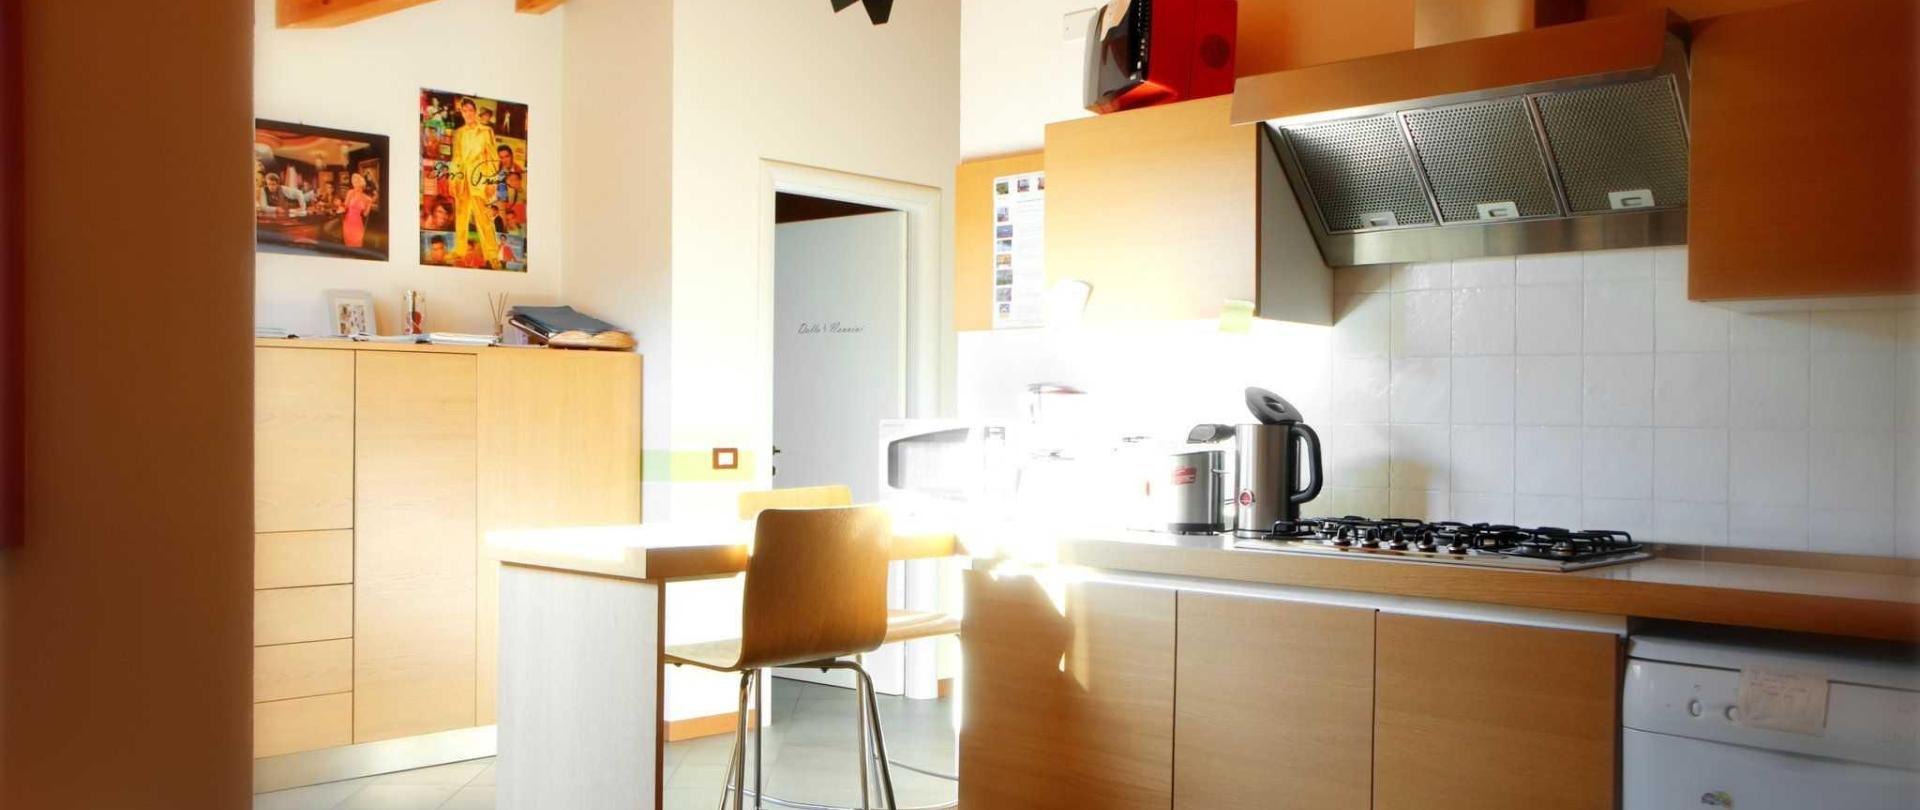 cucina-luminosa.jpg